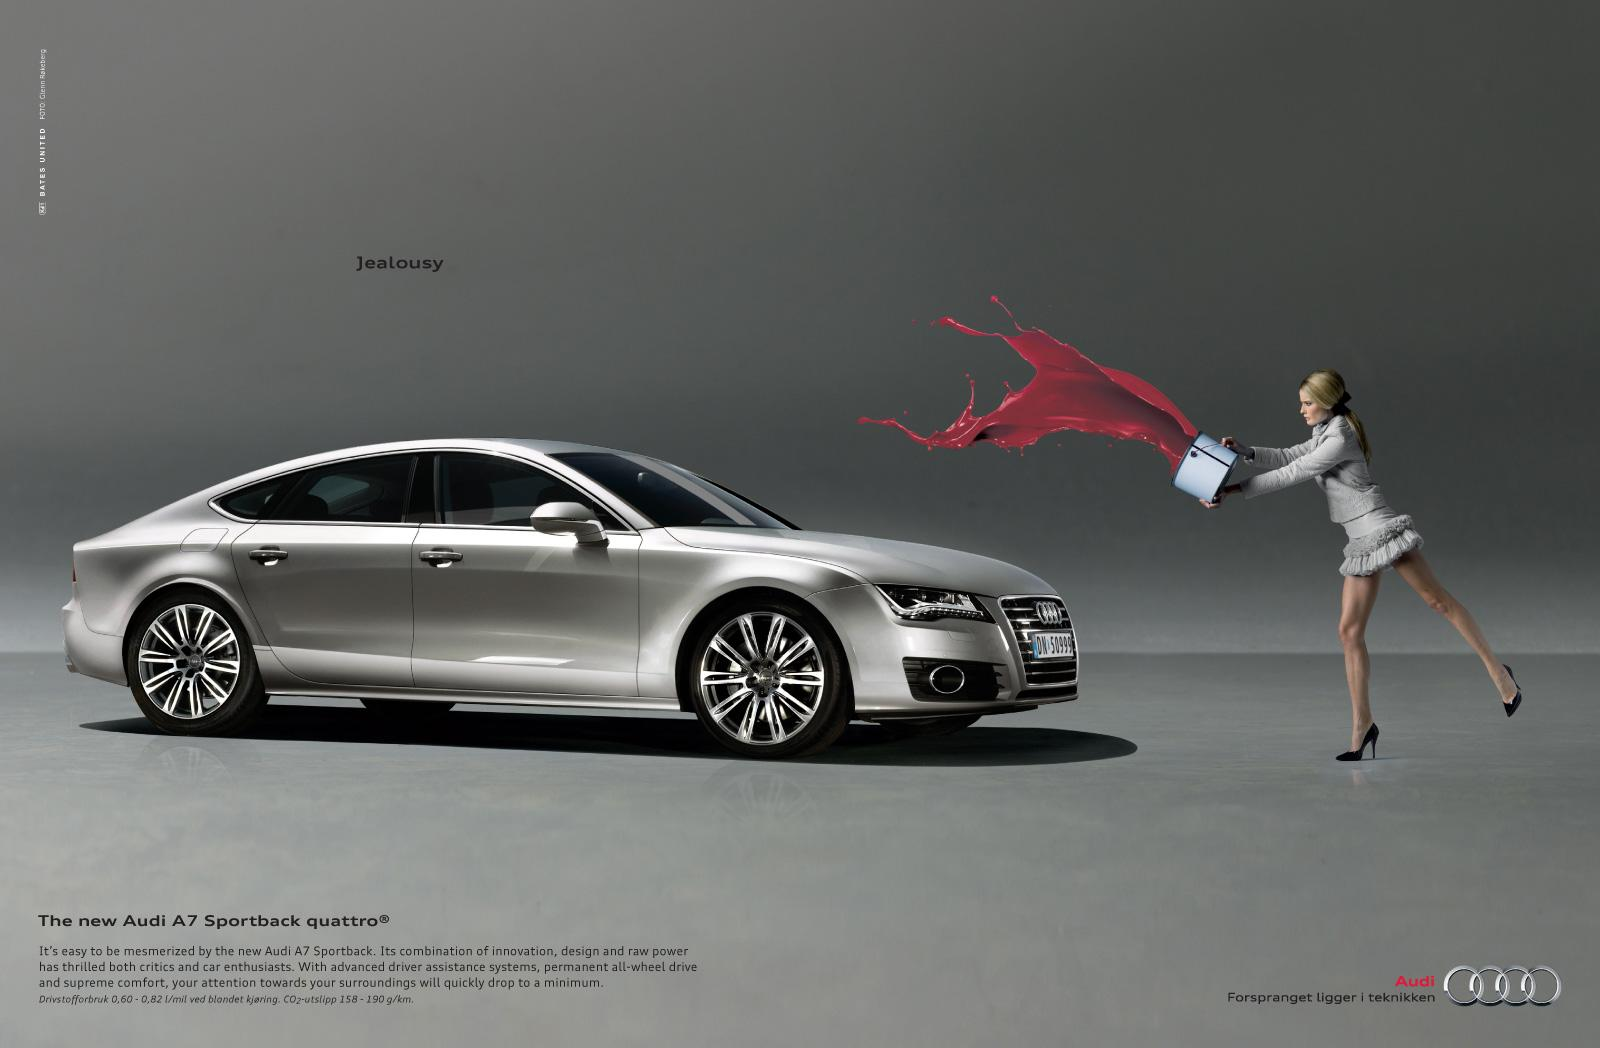 Años 2010- Audi A7 mujer celosa